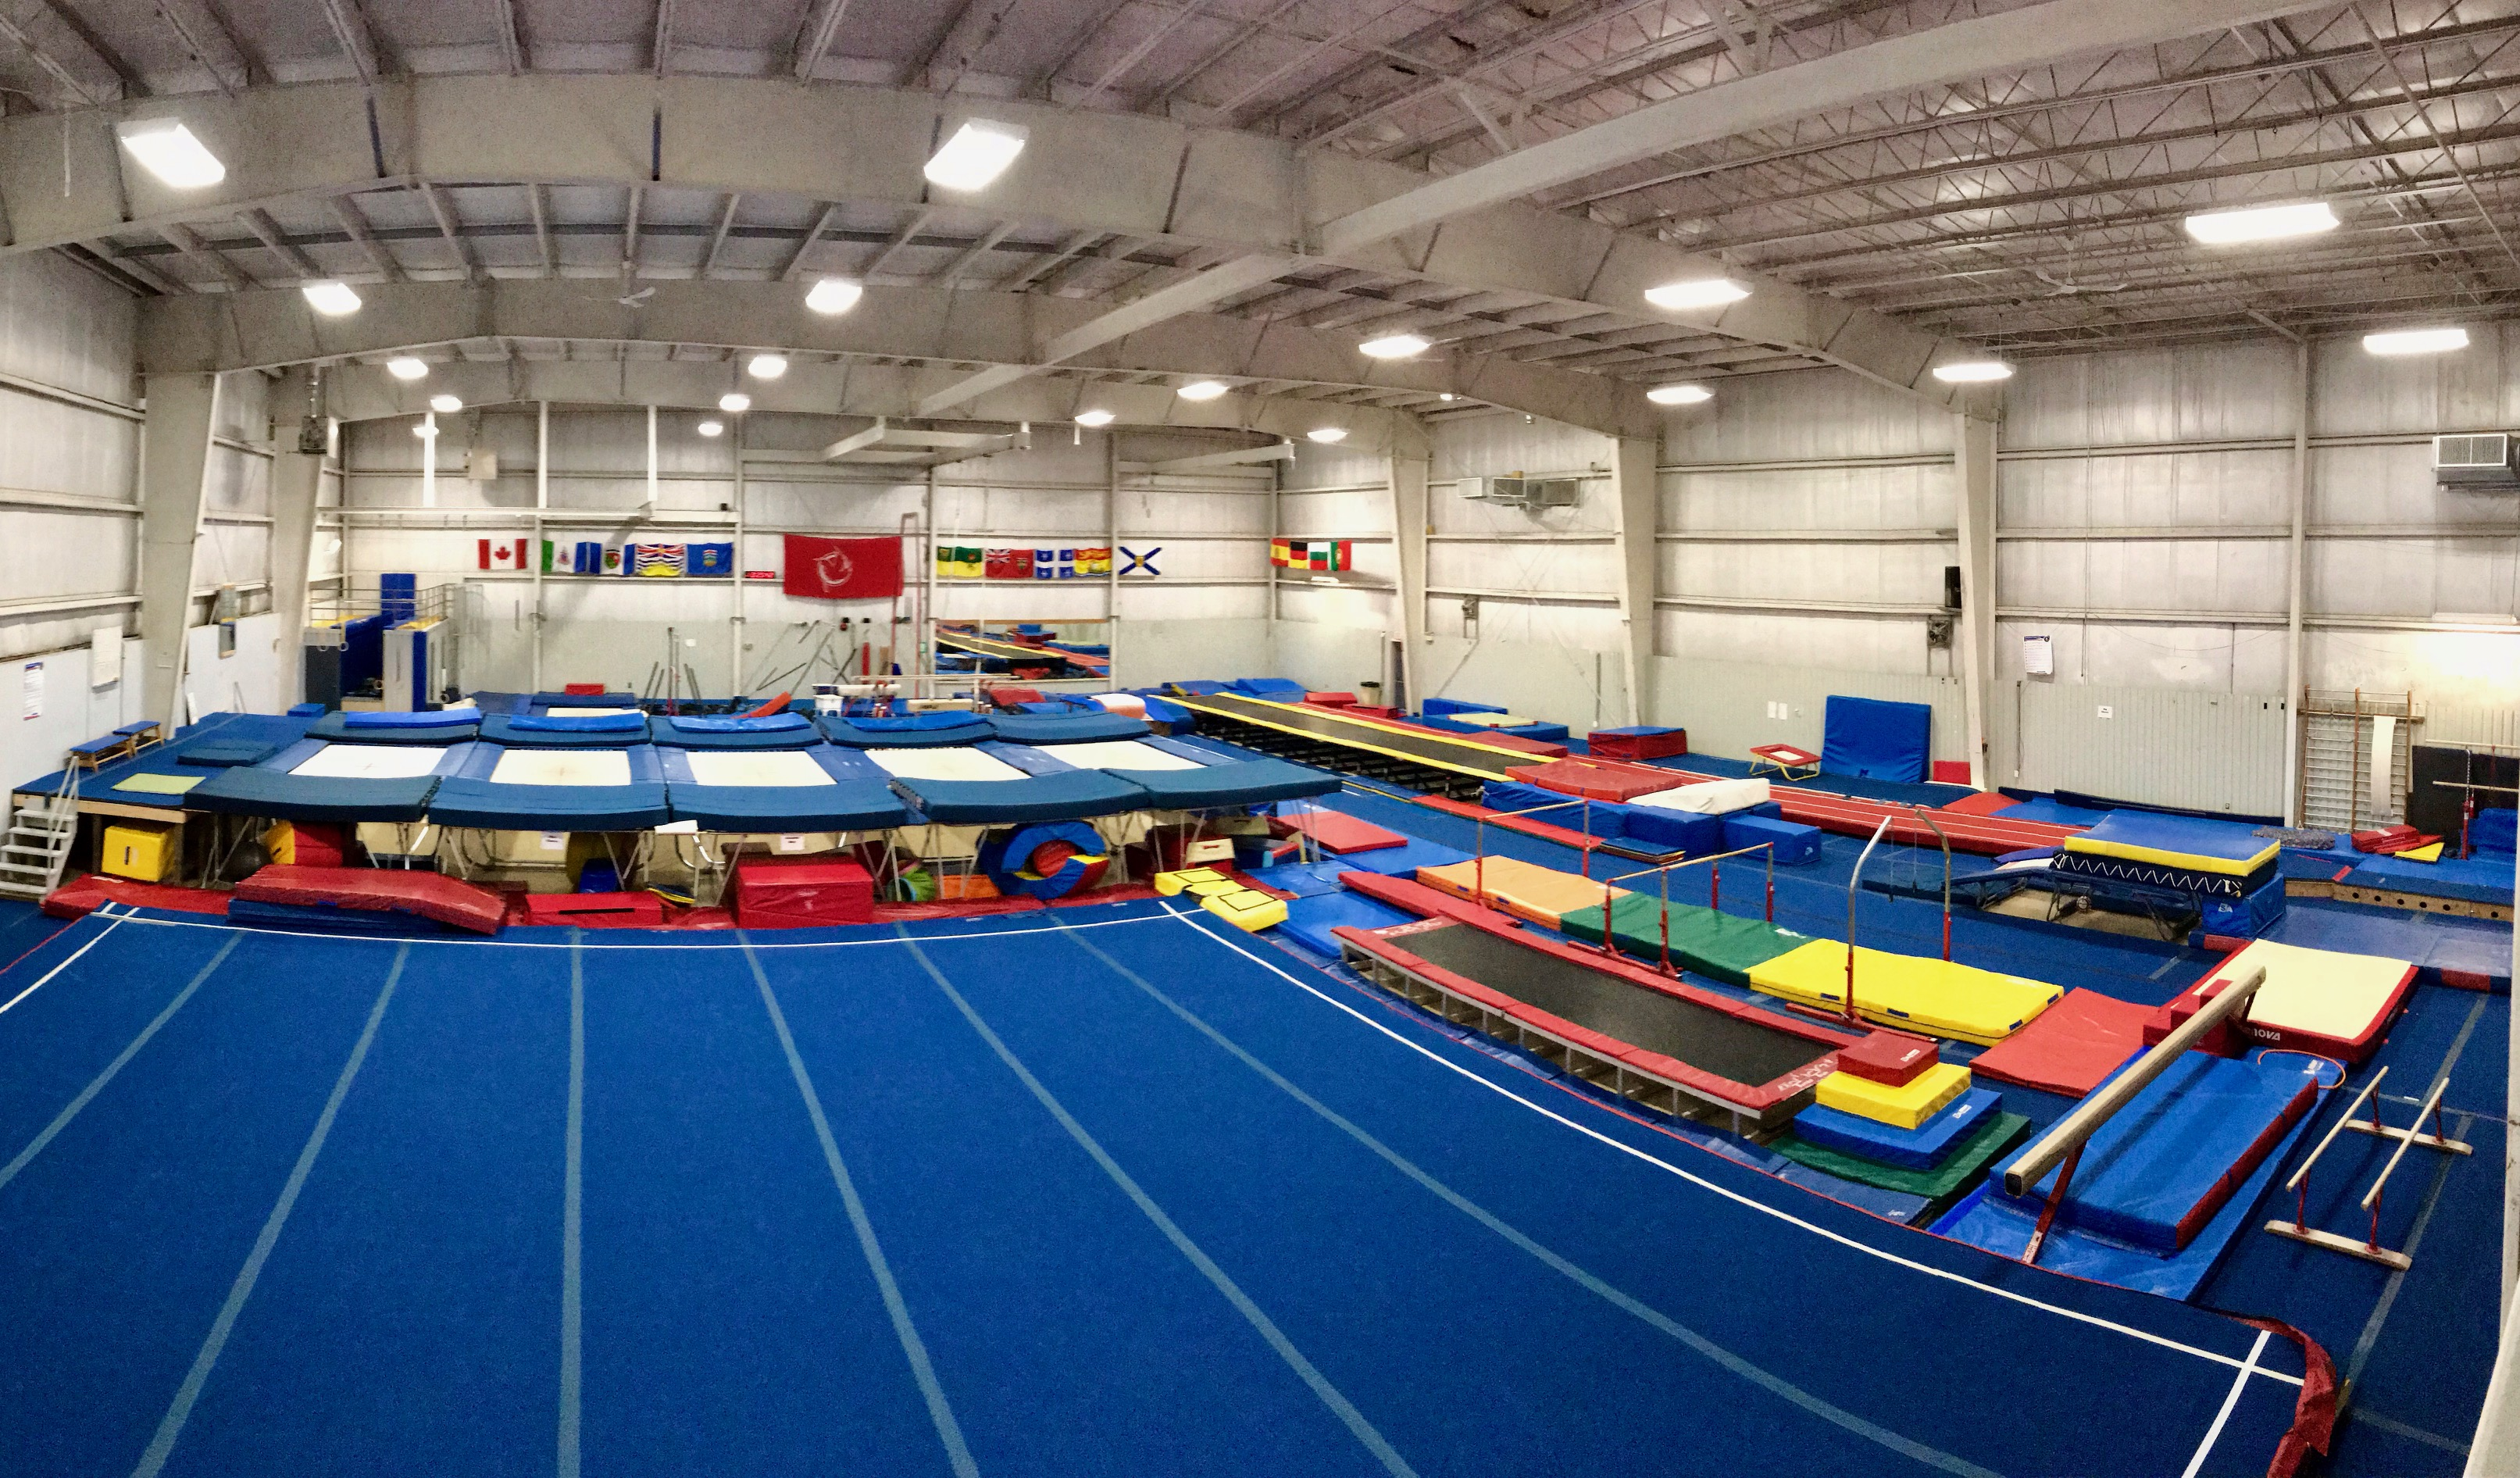 Recreational & Competitive gymnastics